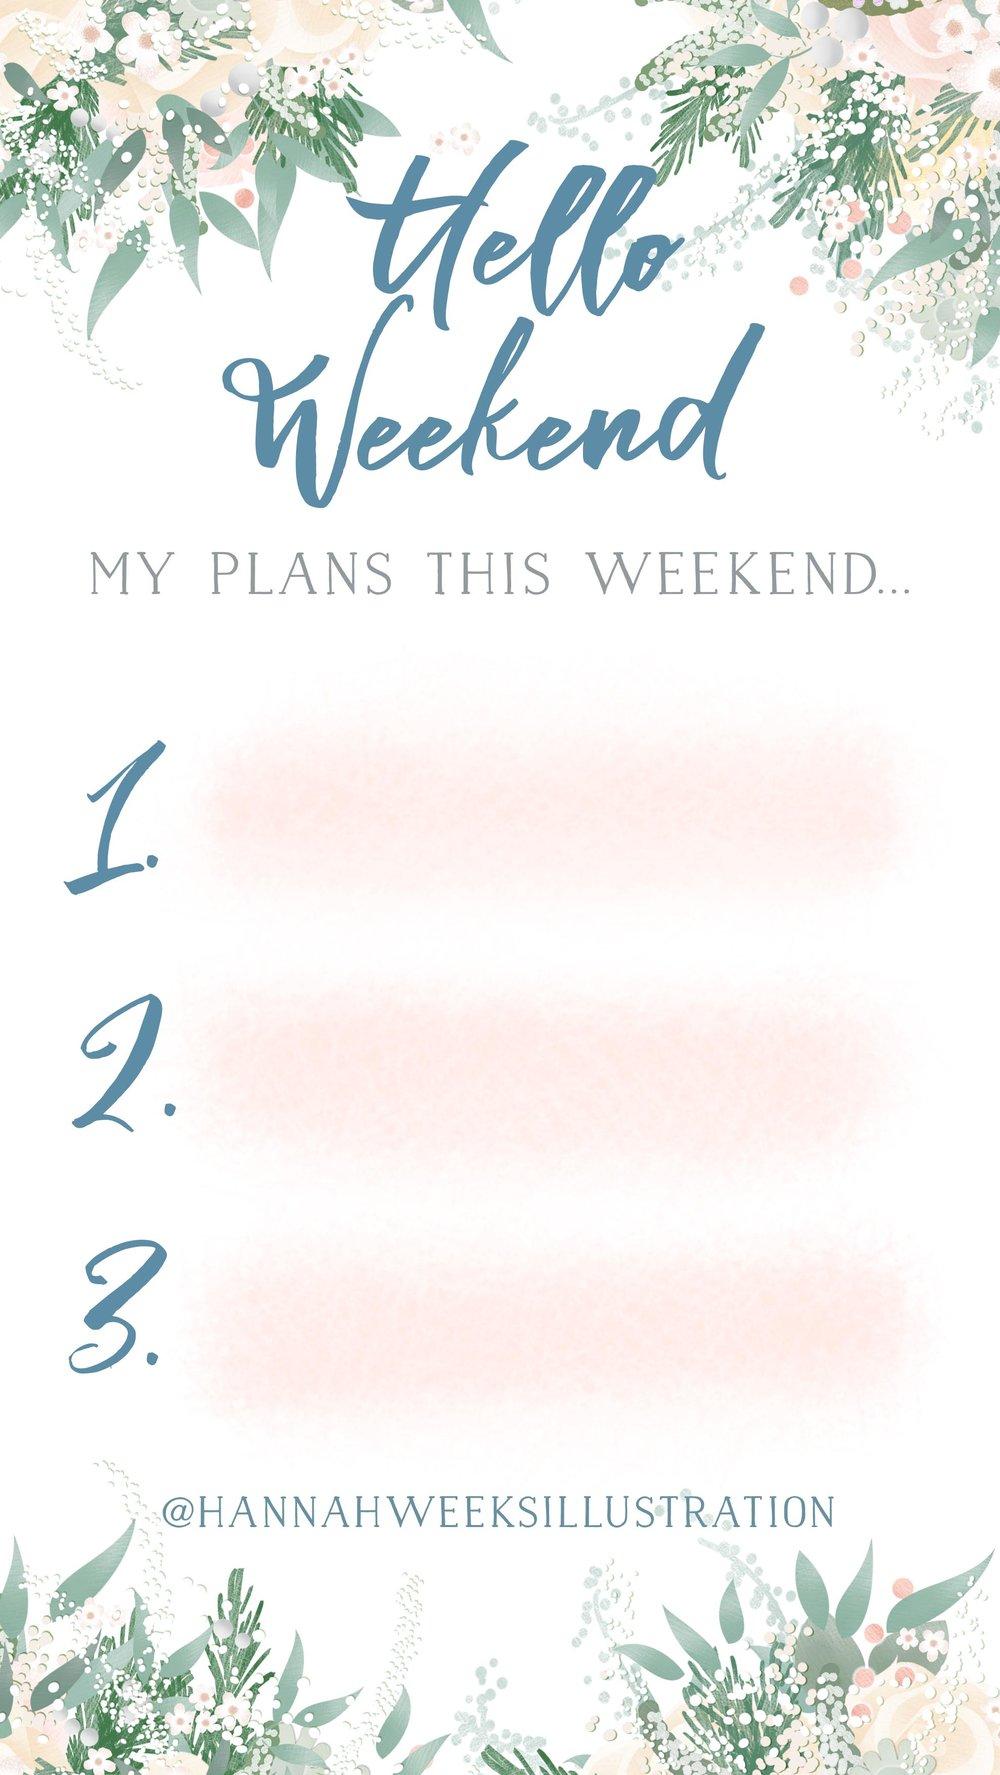 Hannah Weeks Illustration - Hello weekend.jpg